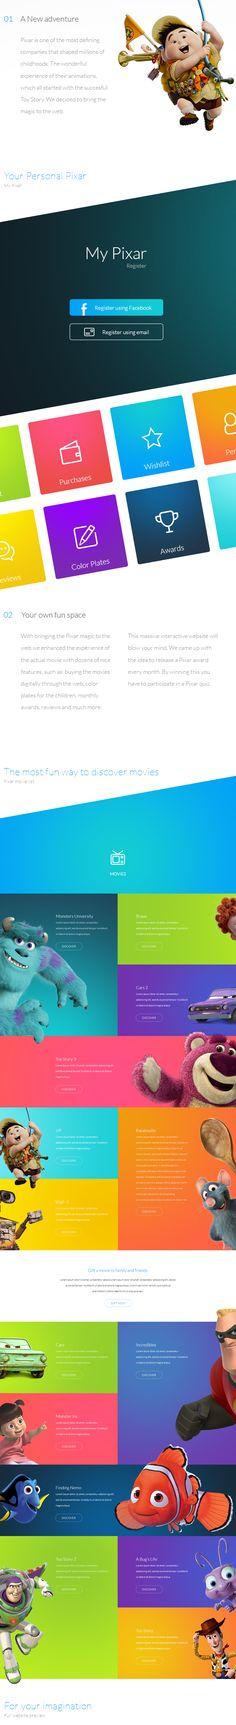 Pixar on Behance